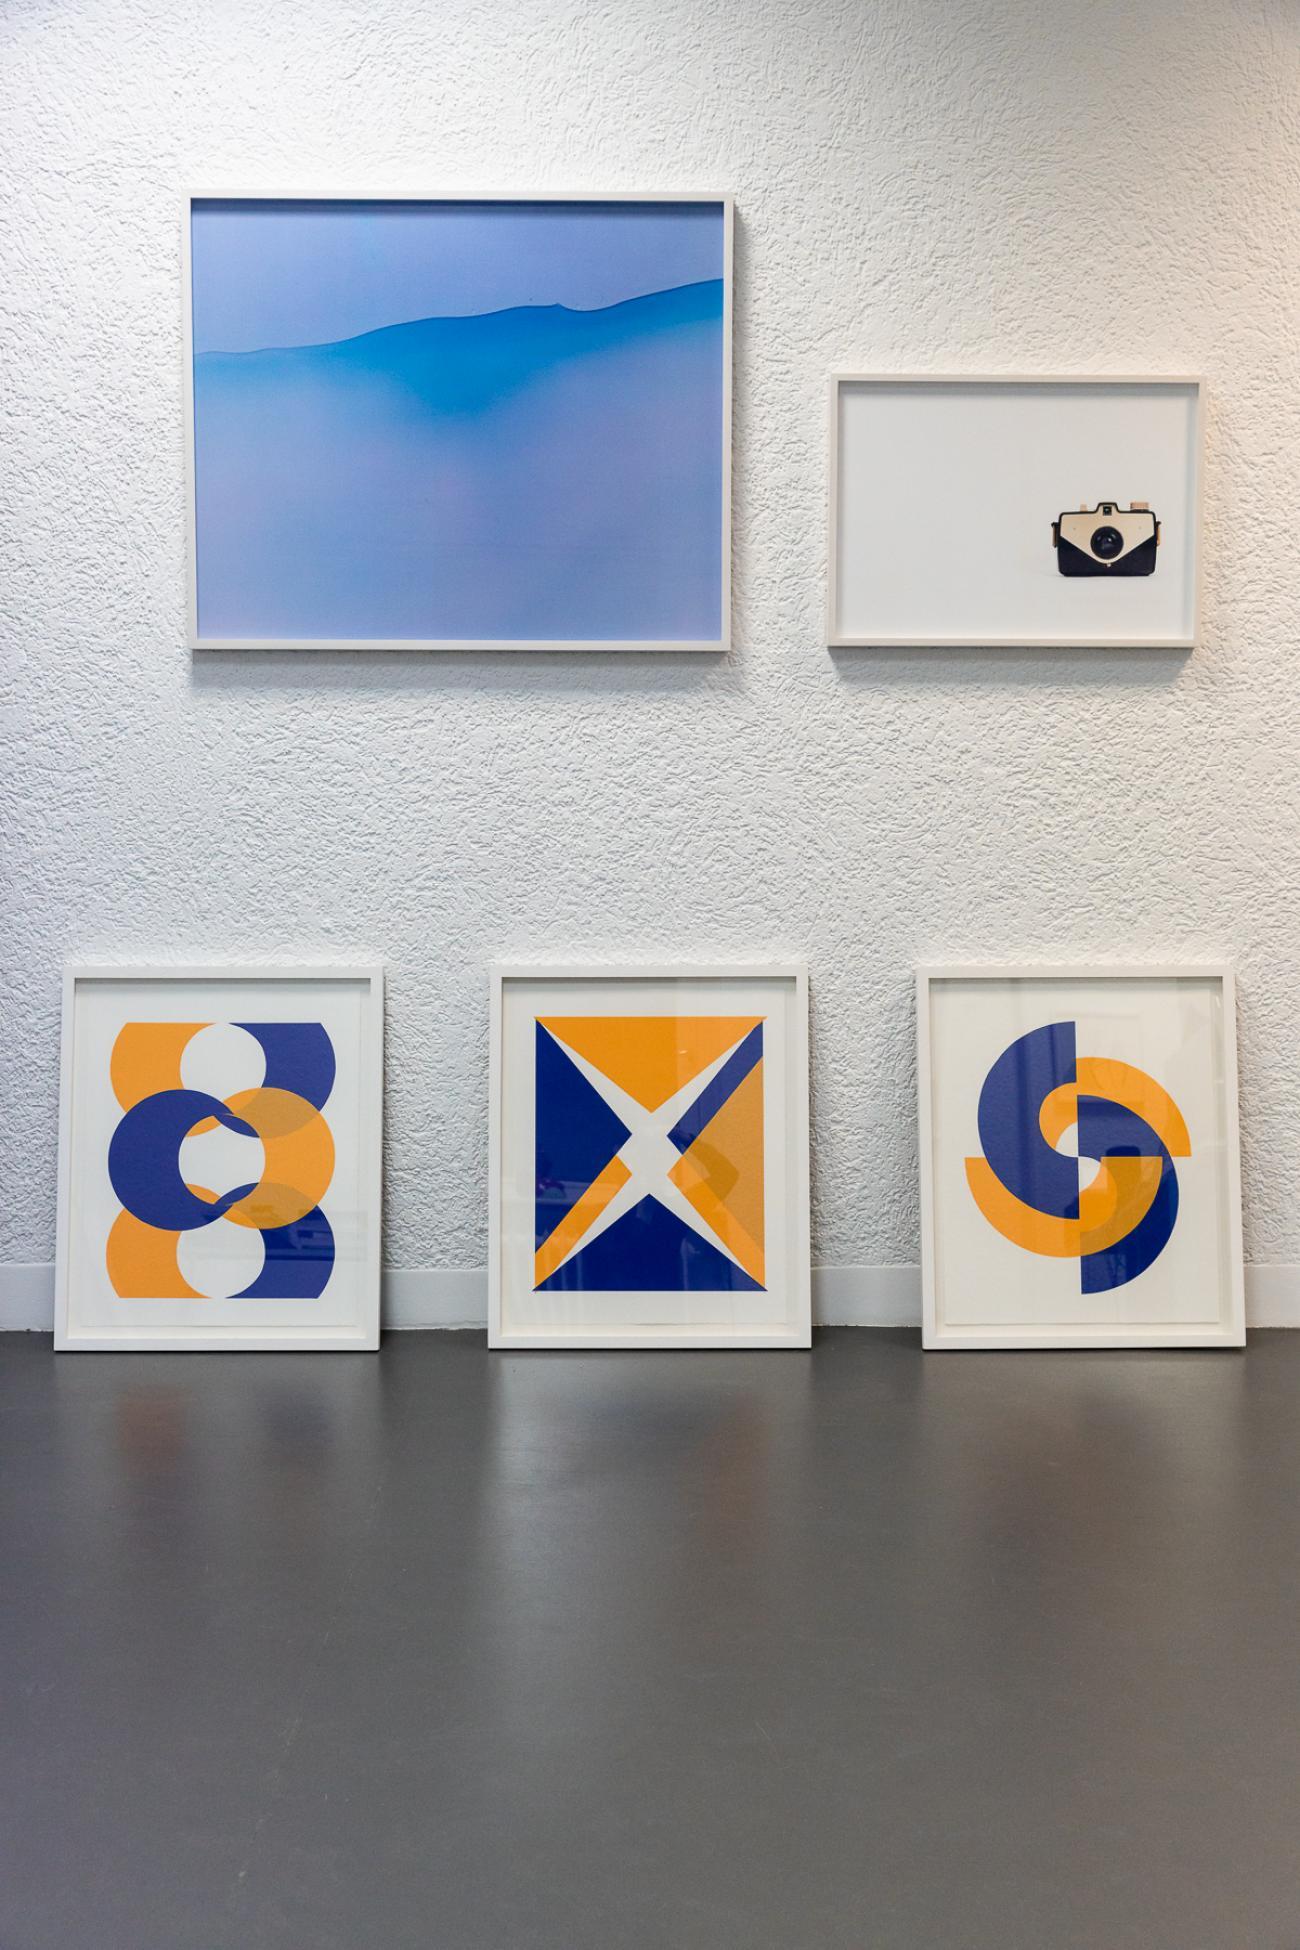 88 VBKI Galeriendinner Schwarz Contemporary BF Inga Haar web?itok=LpFeY Kp